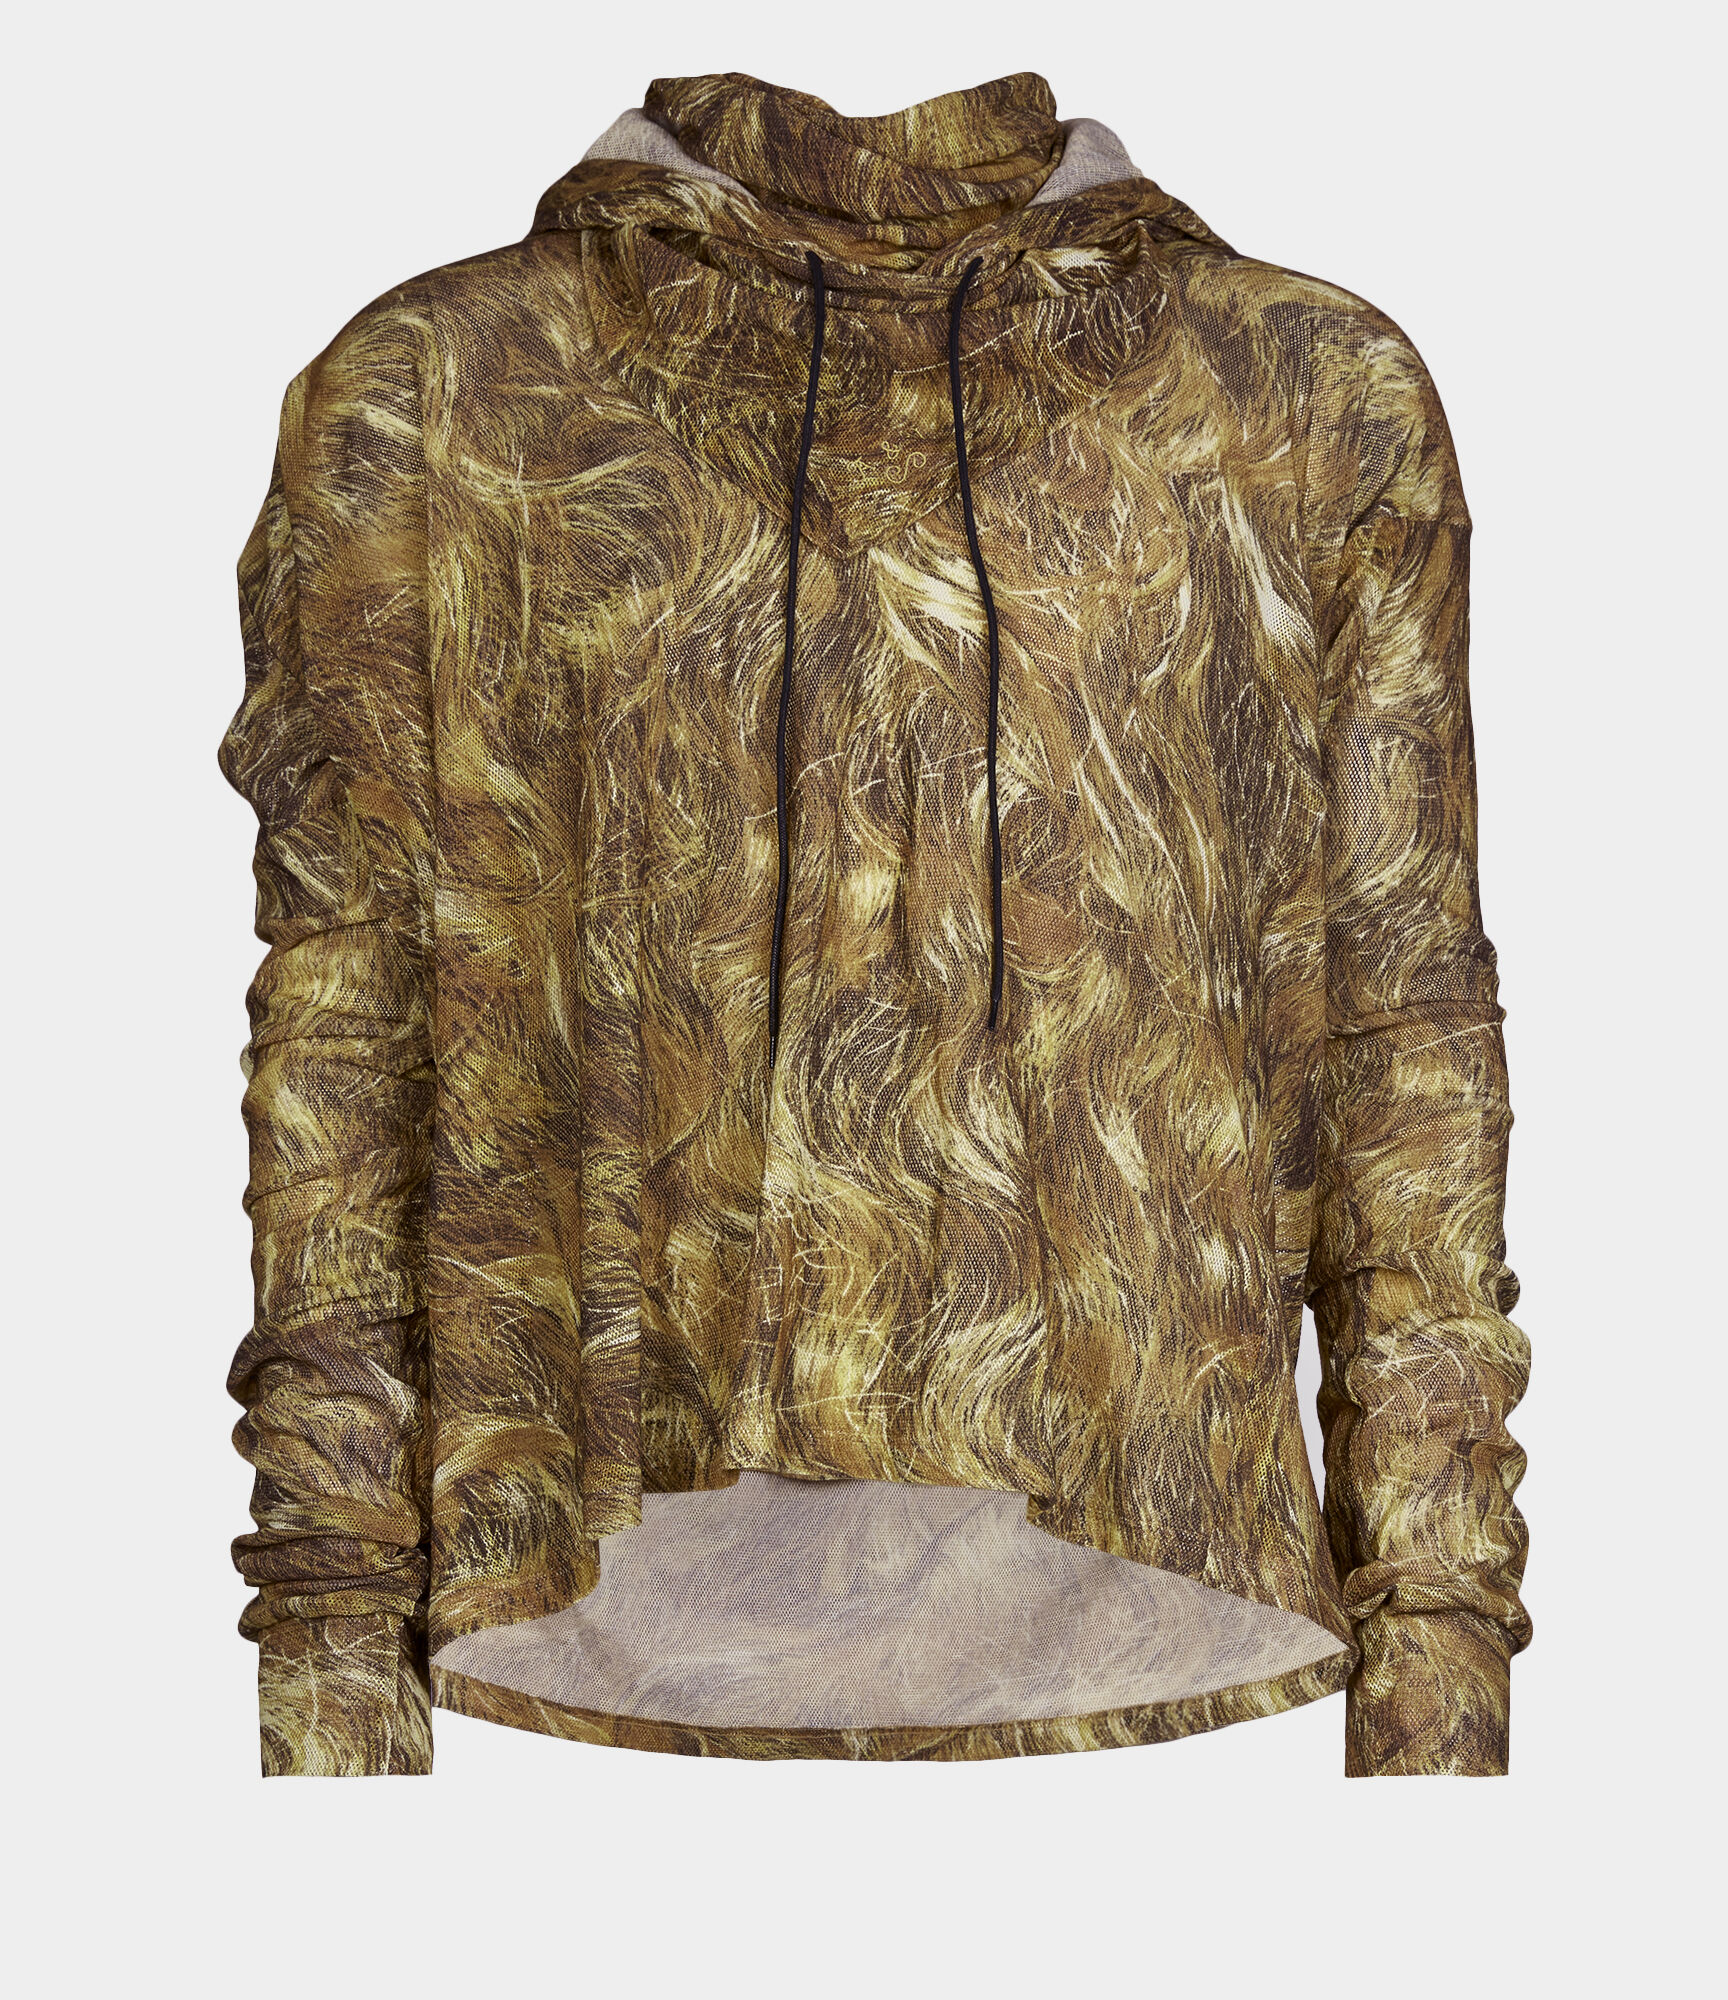 Robin hood  shirt hair print also designer shirts  polos men  clothing vivienne westwood rh viviennewestwood